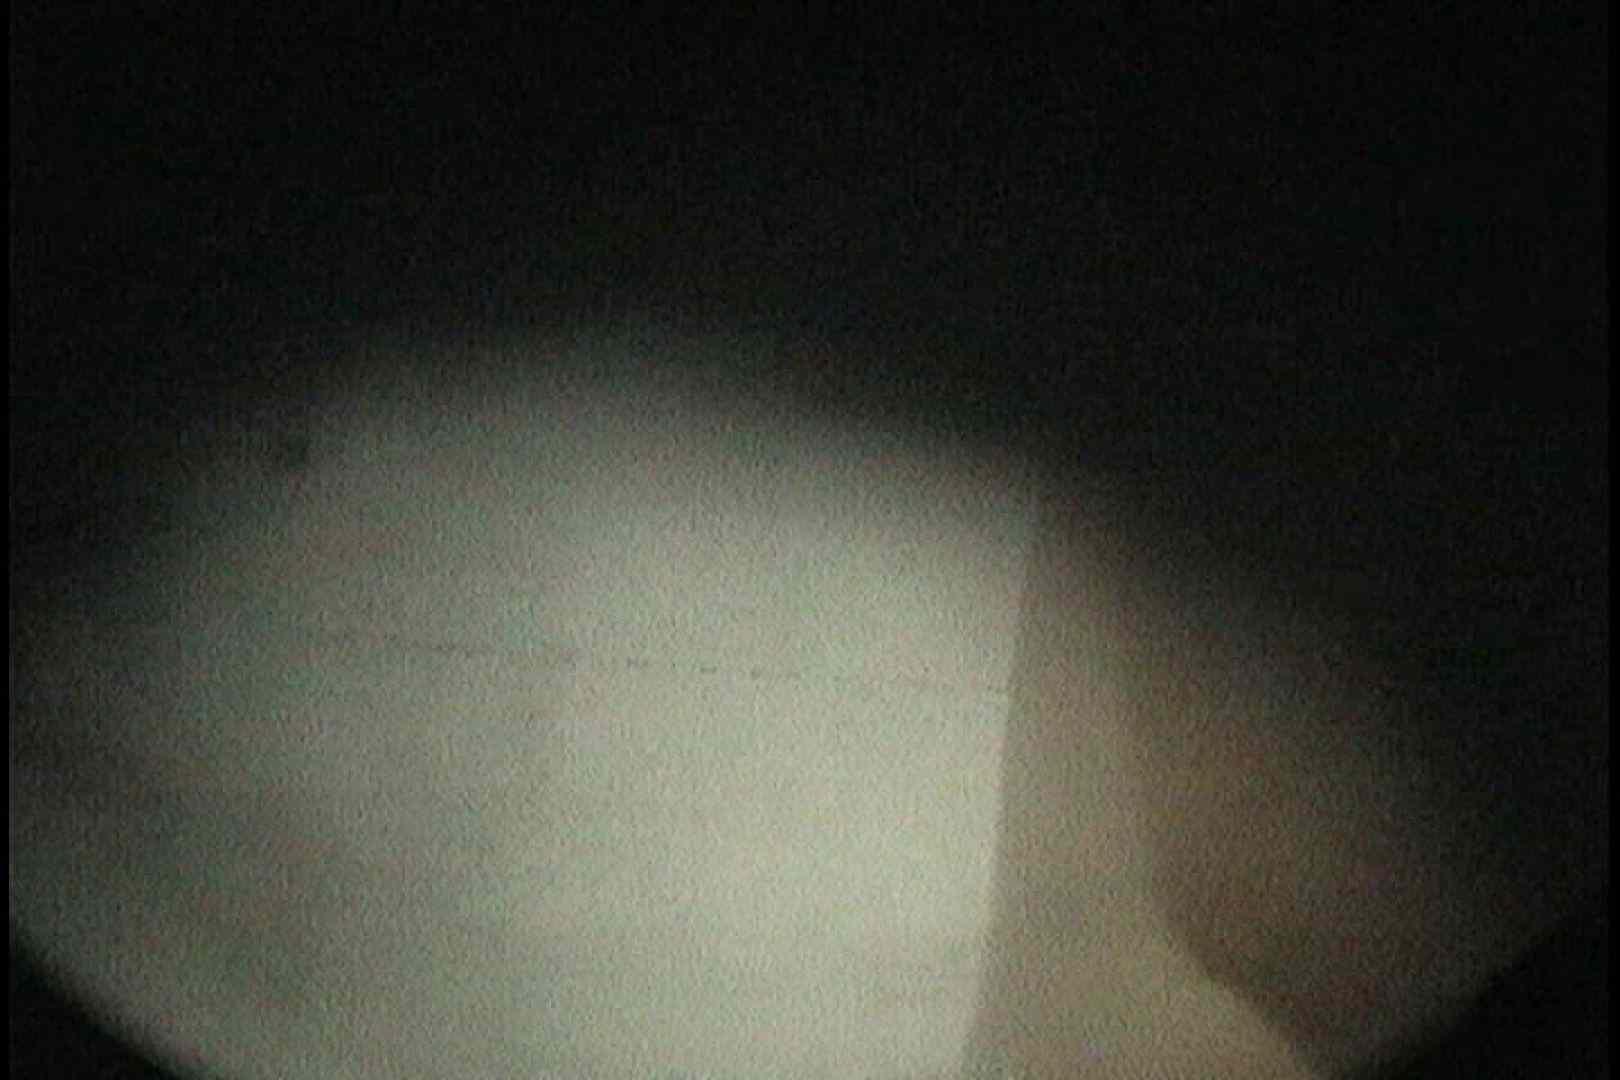 No.68 見事に可愛い巨乳ちゃん 室内暗いです シャワー室 AV動画キャプチャ 79枚 53